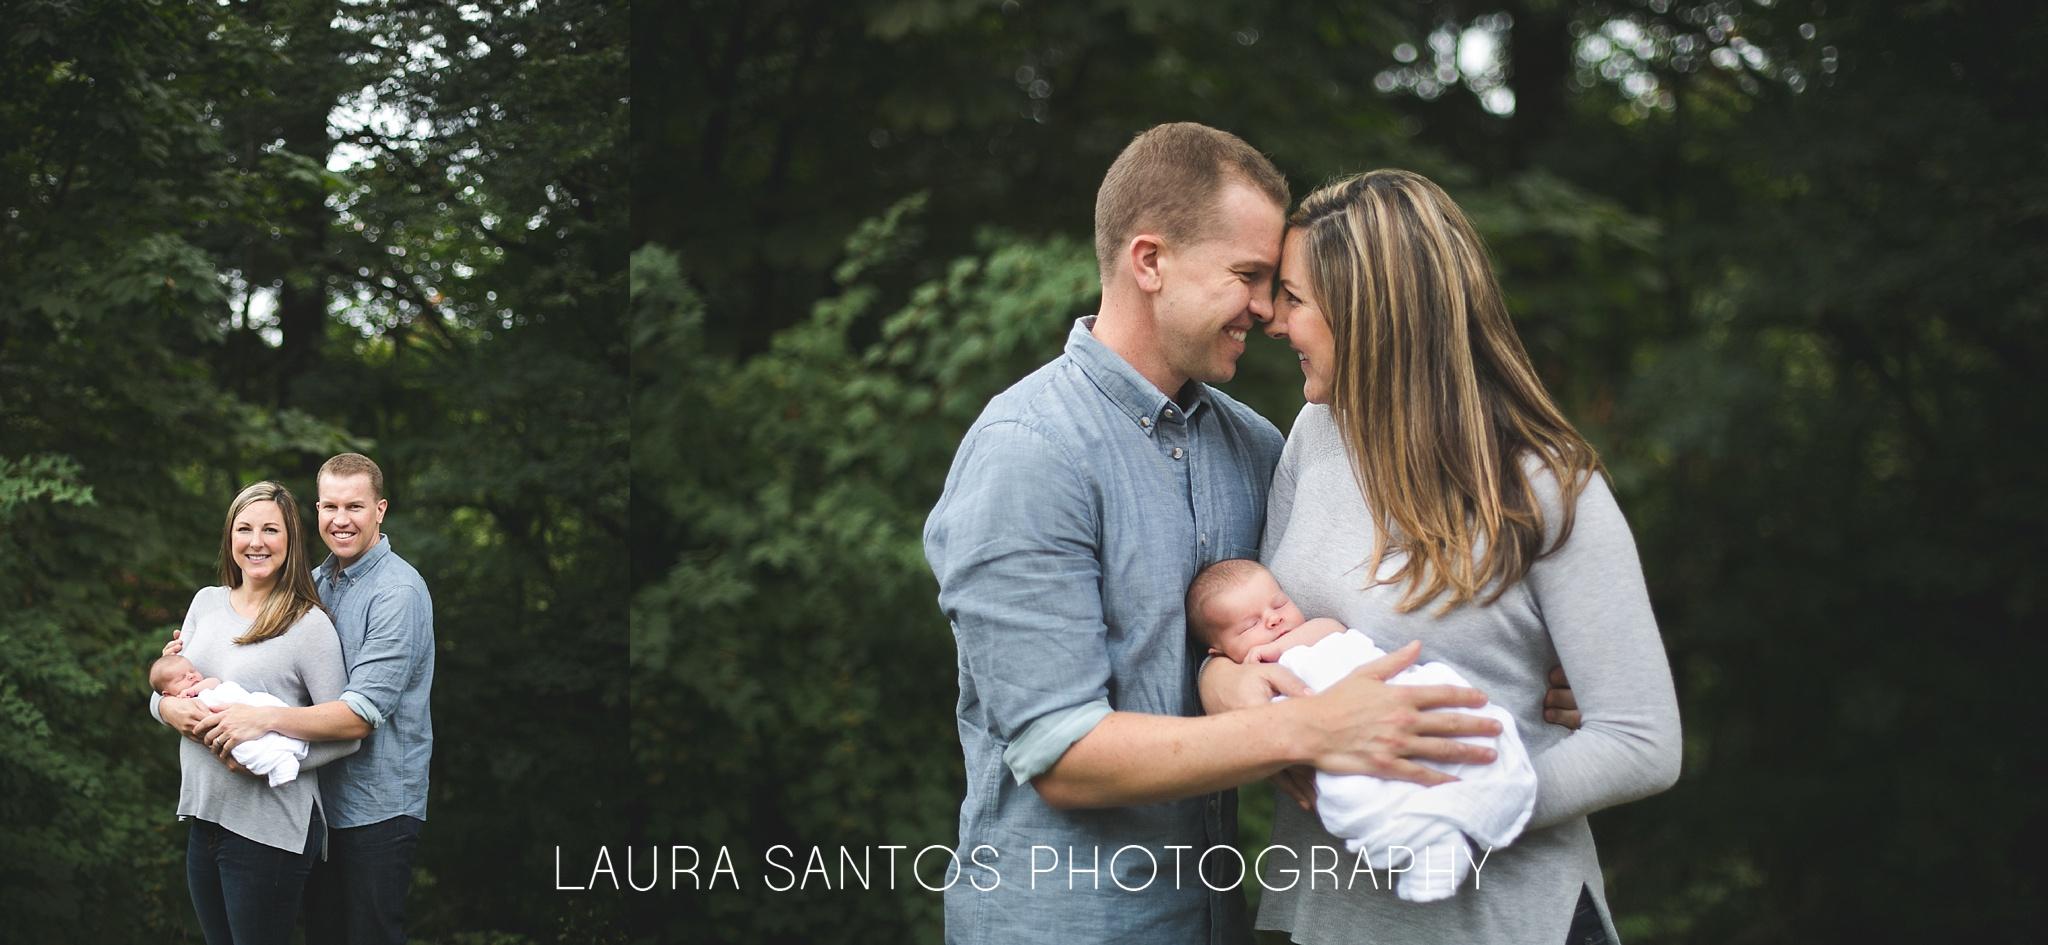 Laura Santos Photography Portland Oregon Family Photographer_0191.jpg